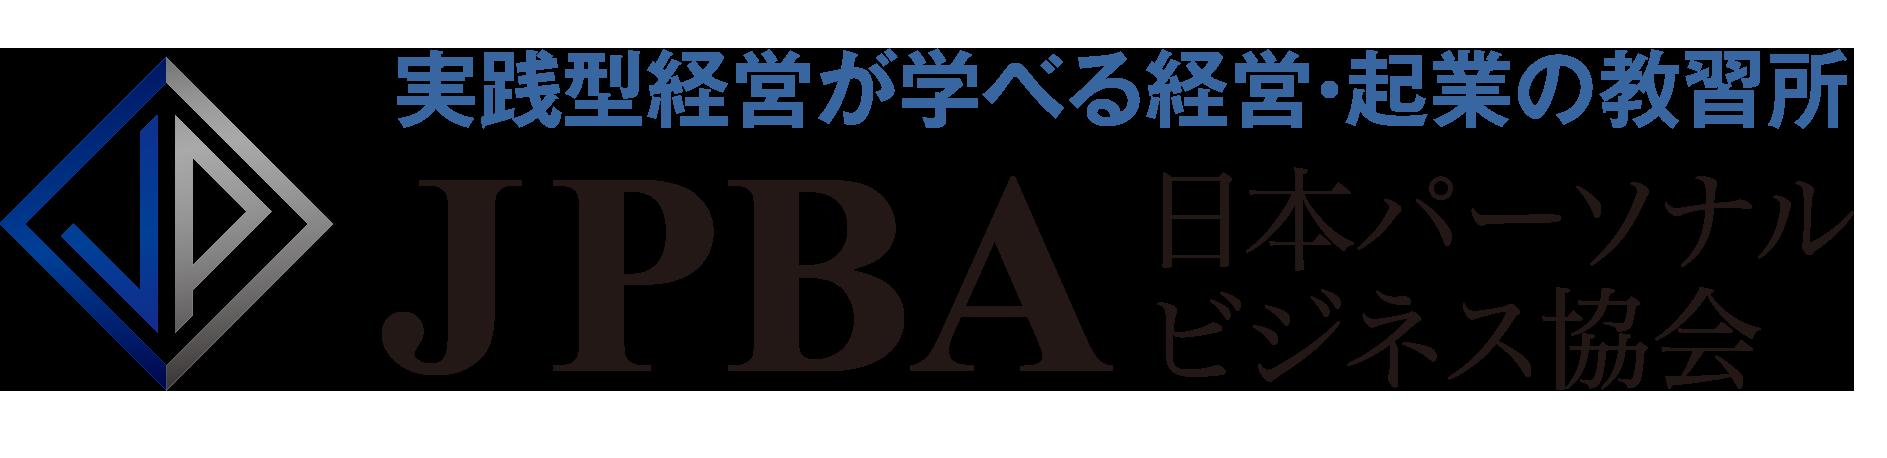  JPBA 一般社団法人日本パーソナルビジネス協会 基礎から経営を学ぼう!